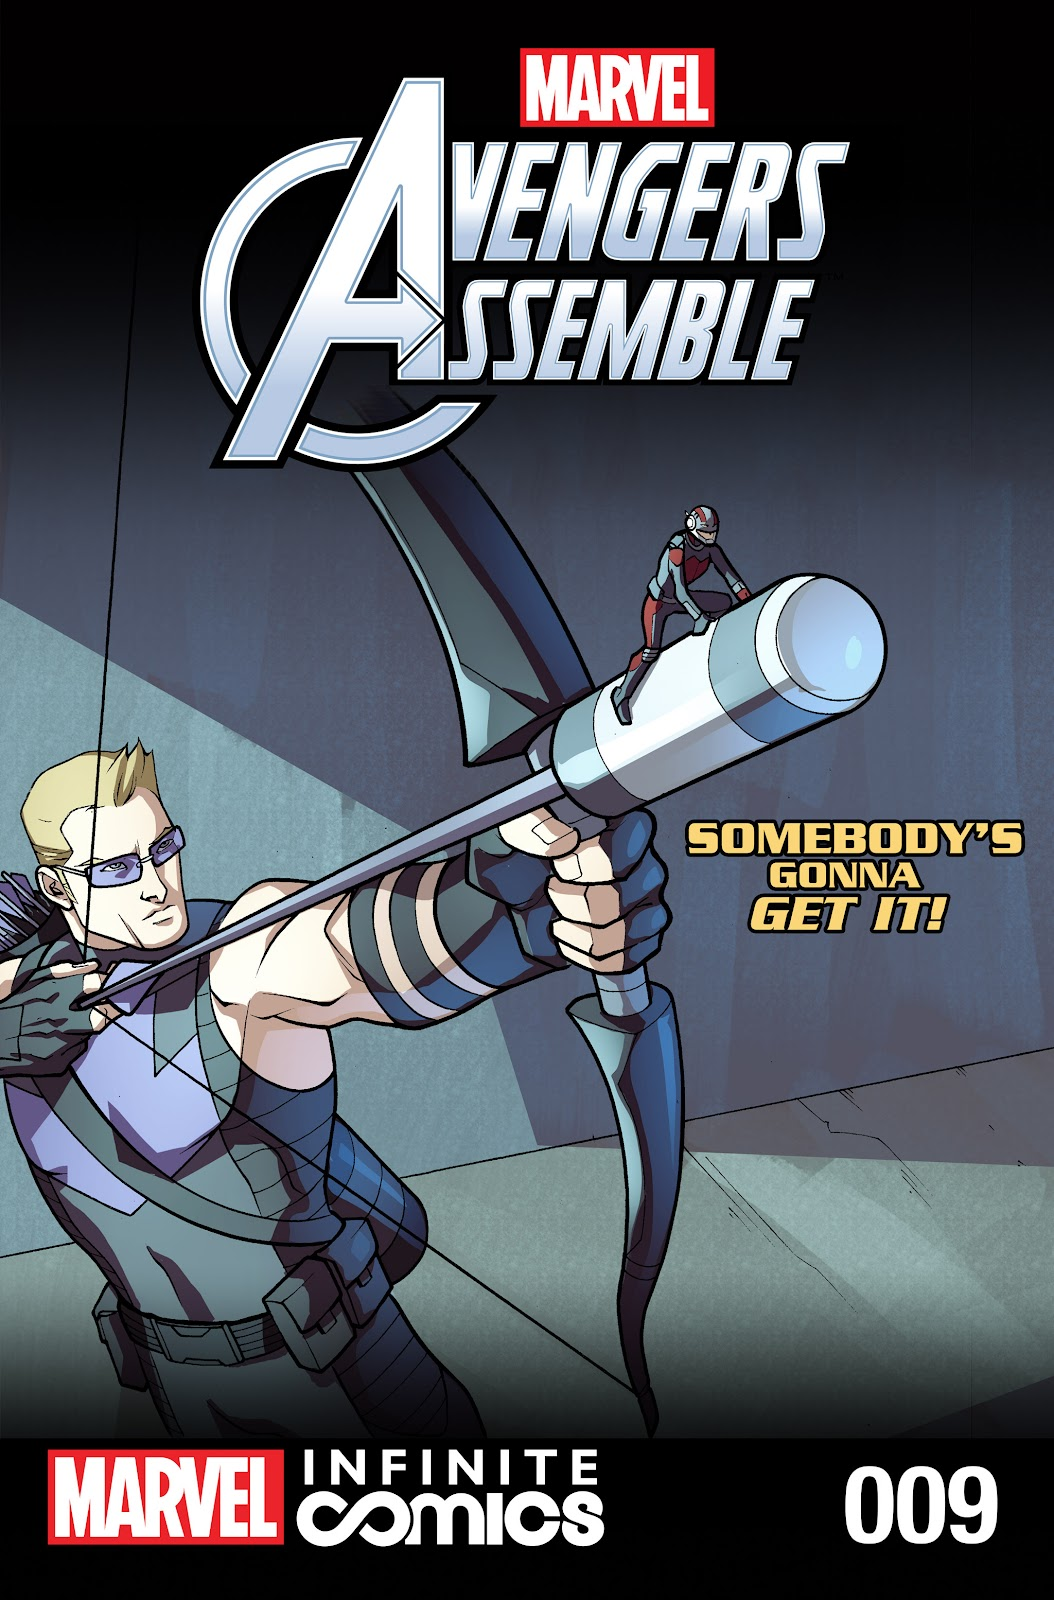 Marvel Universe Avengers Infinite Comic 9 Page 1